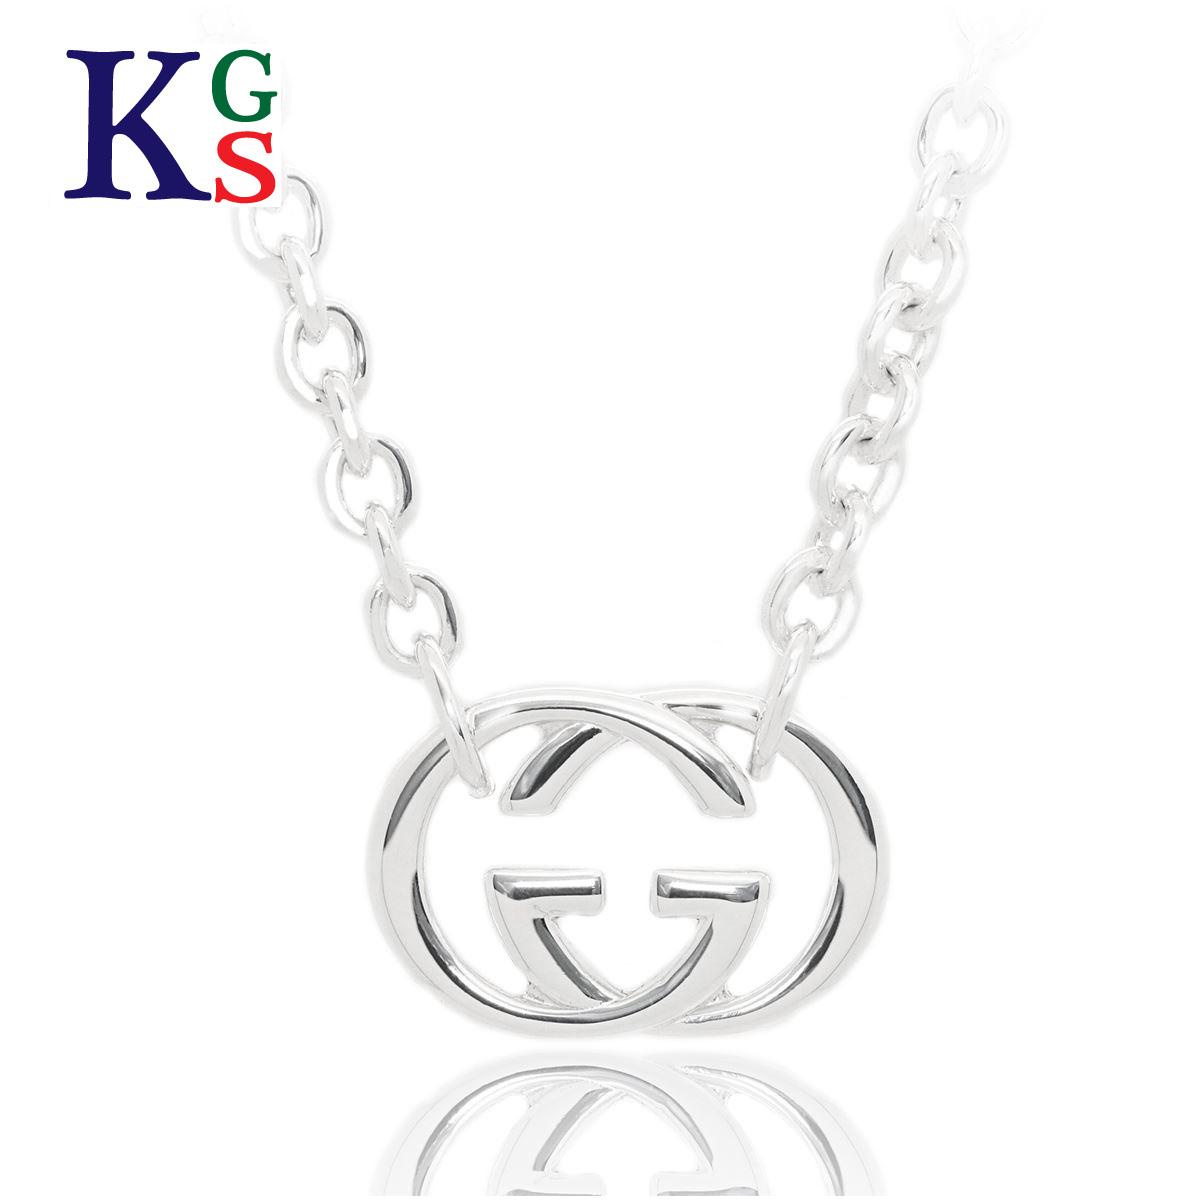 Gucci /GUCCI pendant Lady\u0027s GG necklace silver Bullitt sterling silver  SV925 190489 JJ8400 8106